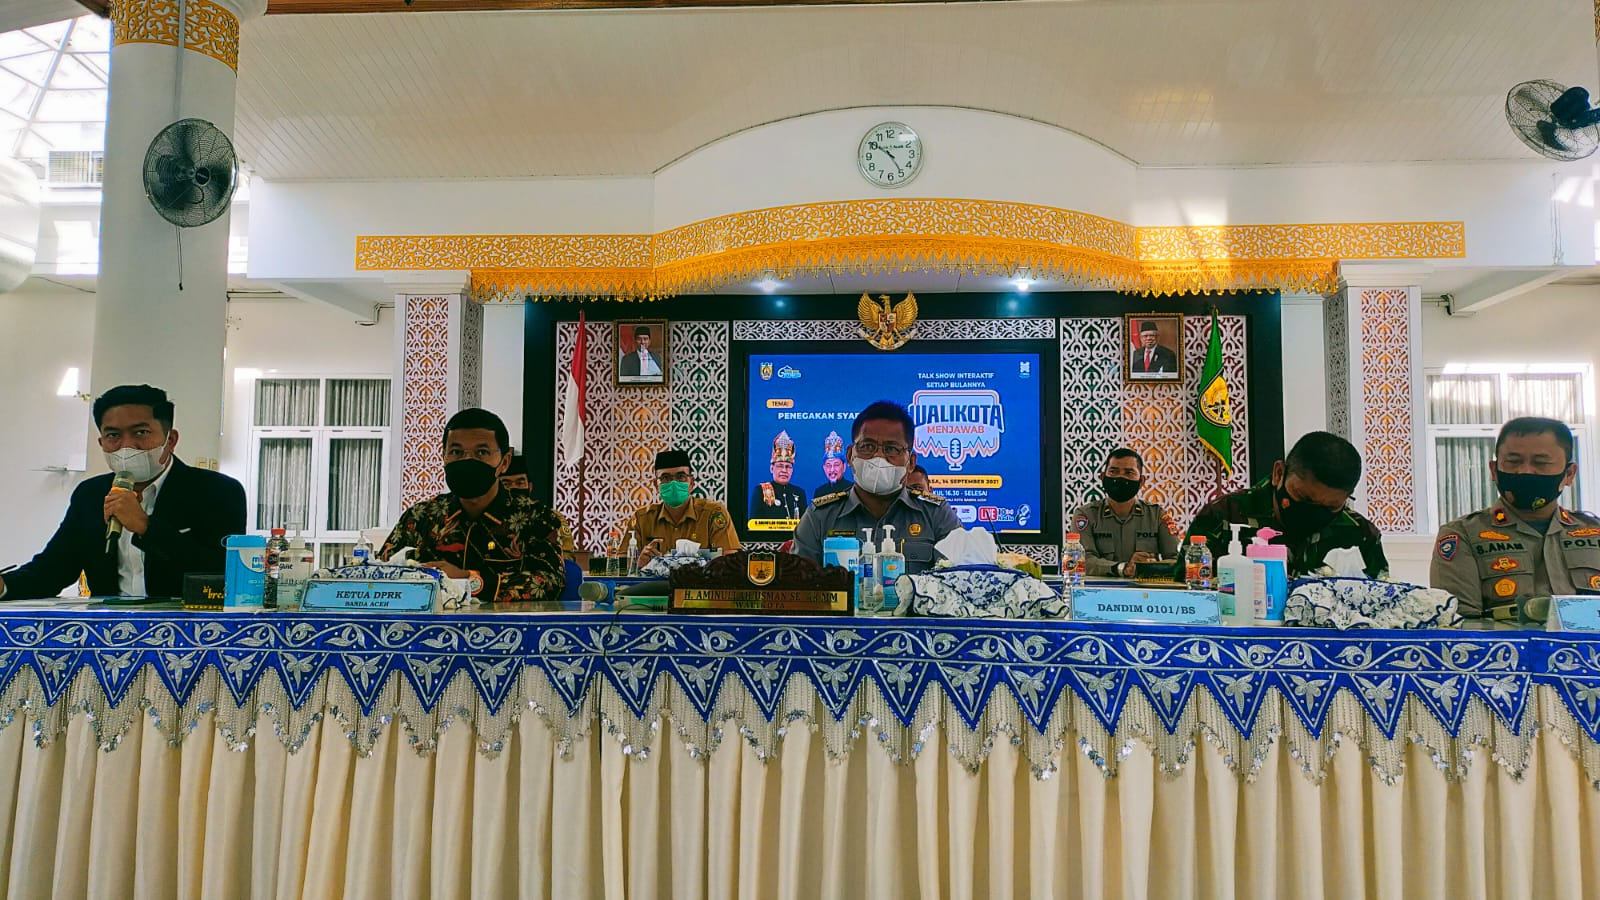 Kasatbinmas Polresta Banda Aceh Menjadi Narasumber Program Walikota Menjawab